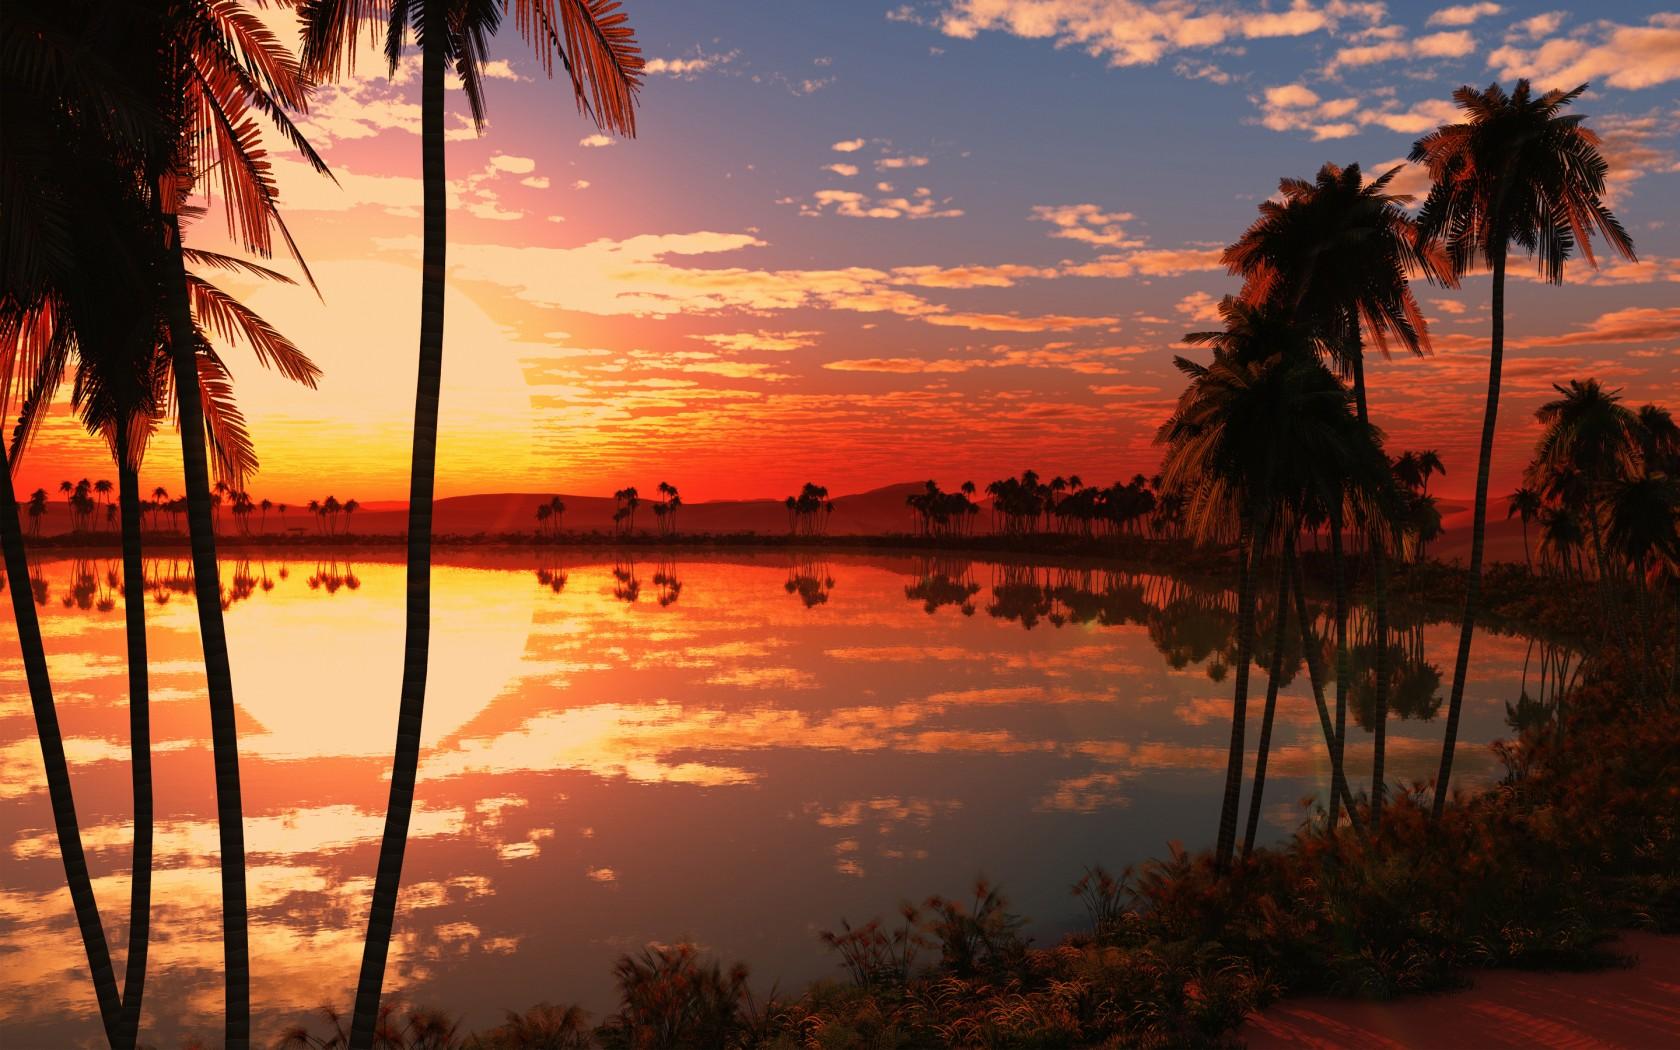 Cute Lock Screen Wallpaper Iphone Beautiful Lake Sunset Wallpapers Hd Wallpapers Id 18052